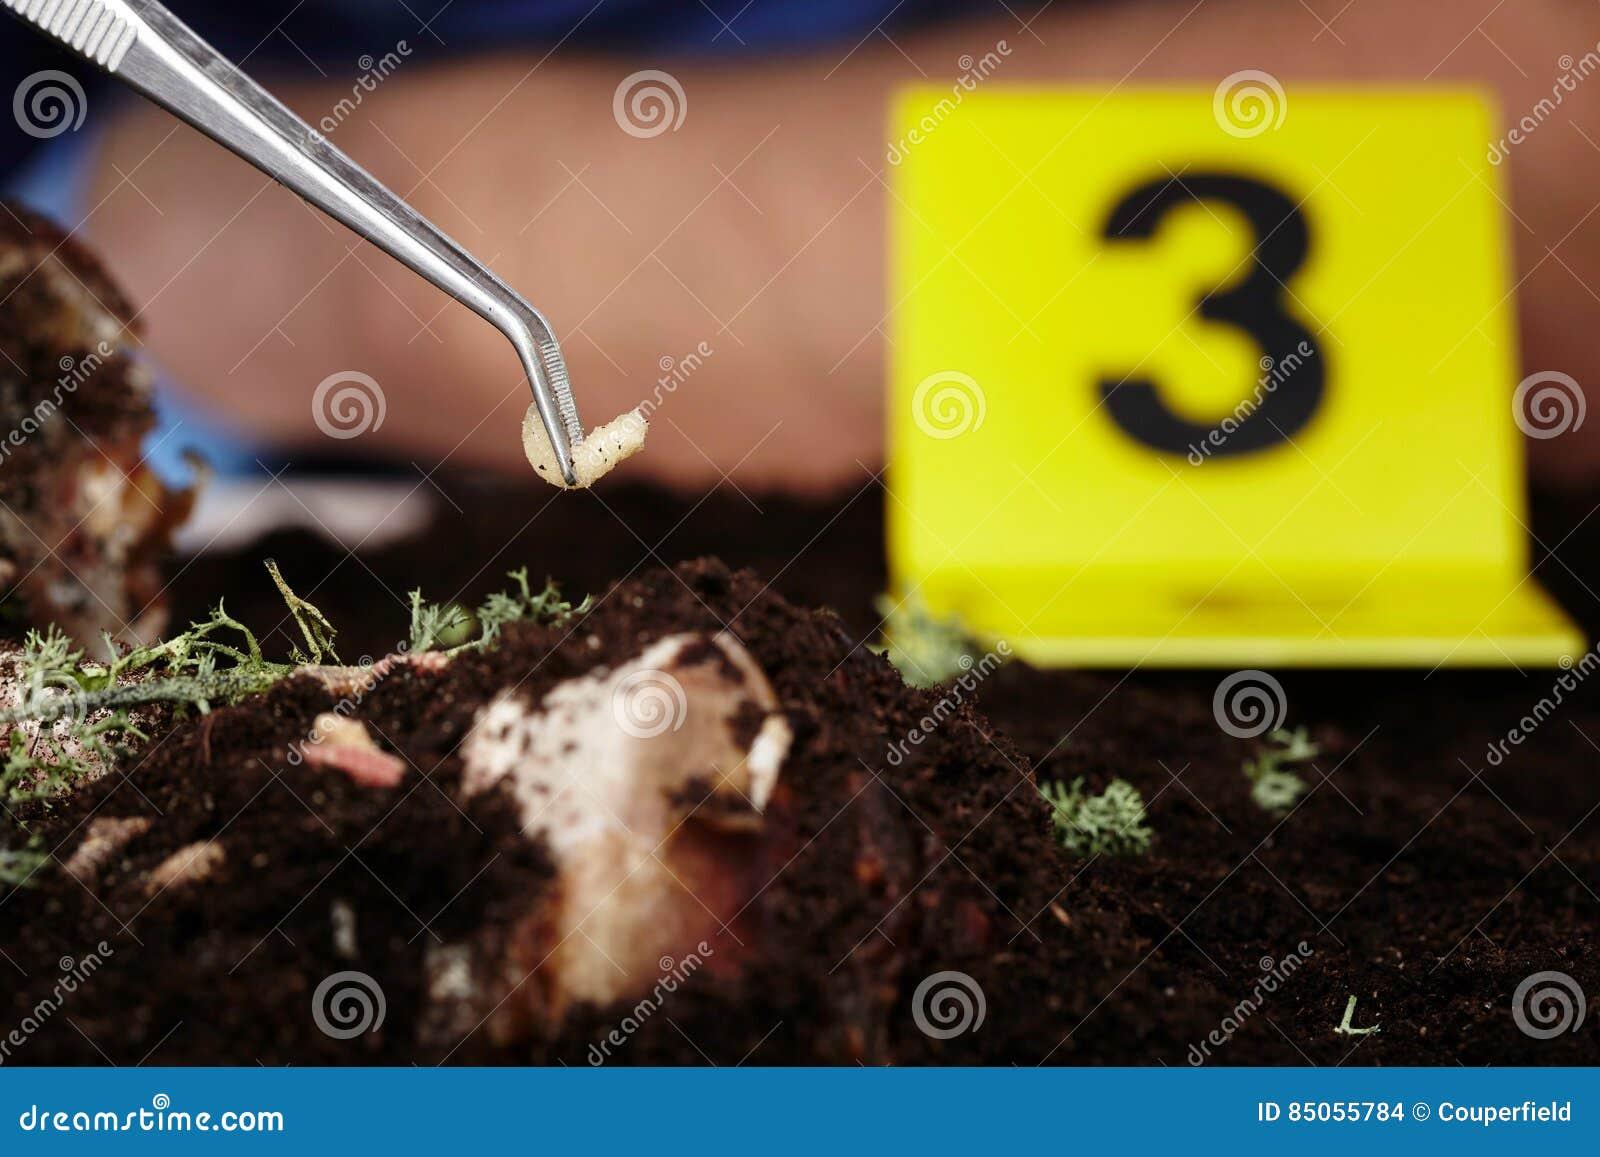 Pick up of fly larva on crime scene